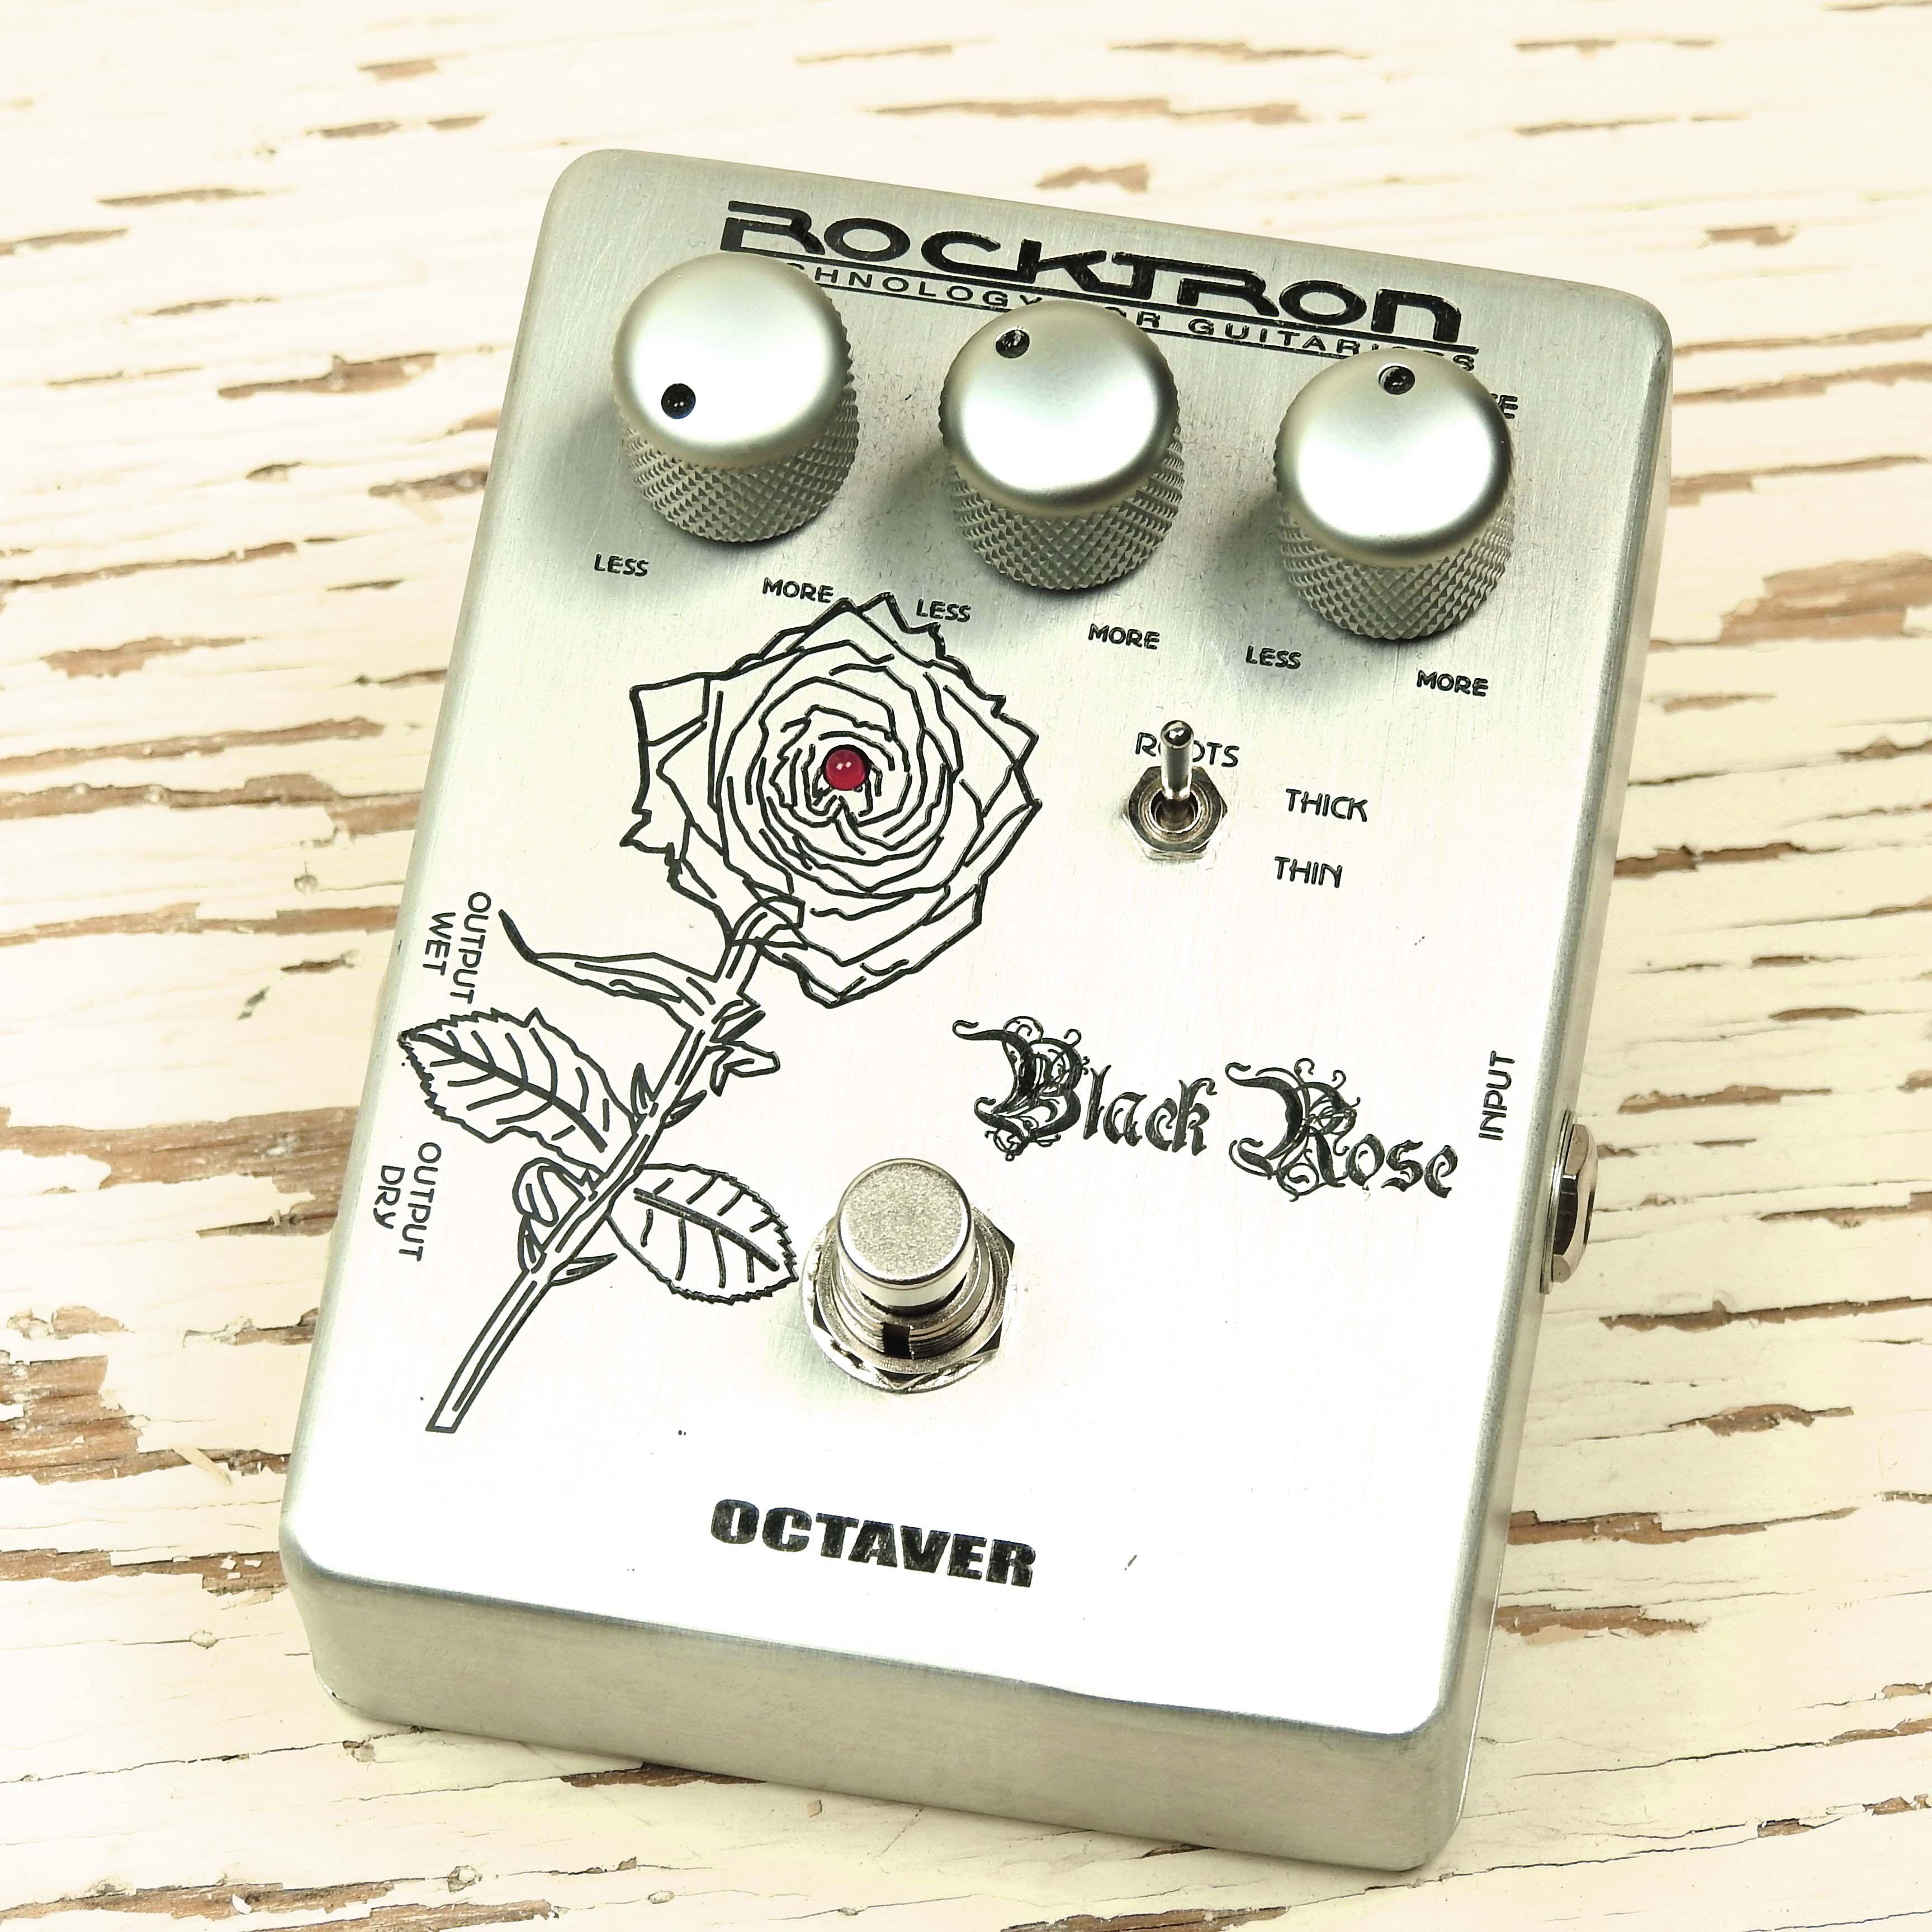 Used Rocktron Black Rose Octaver V1 Octave Fuzz Effects Pedal Guitar